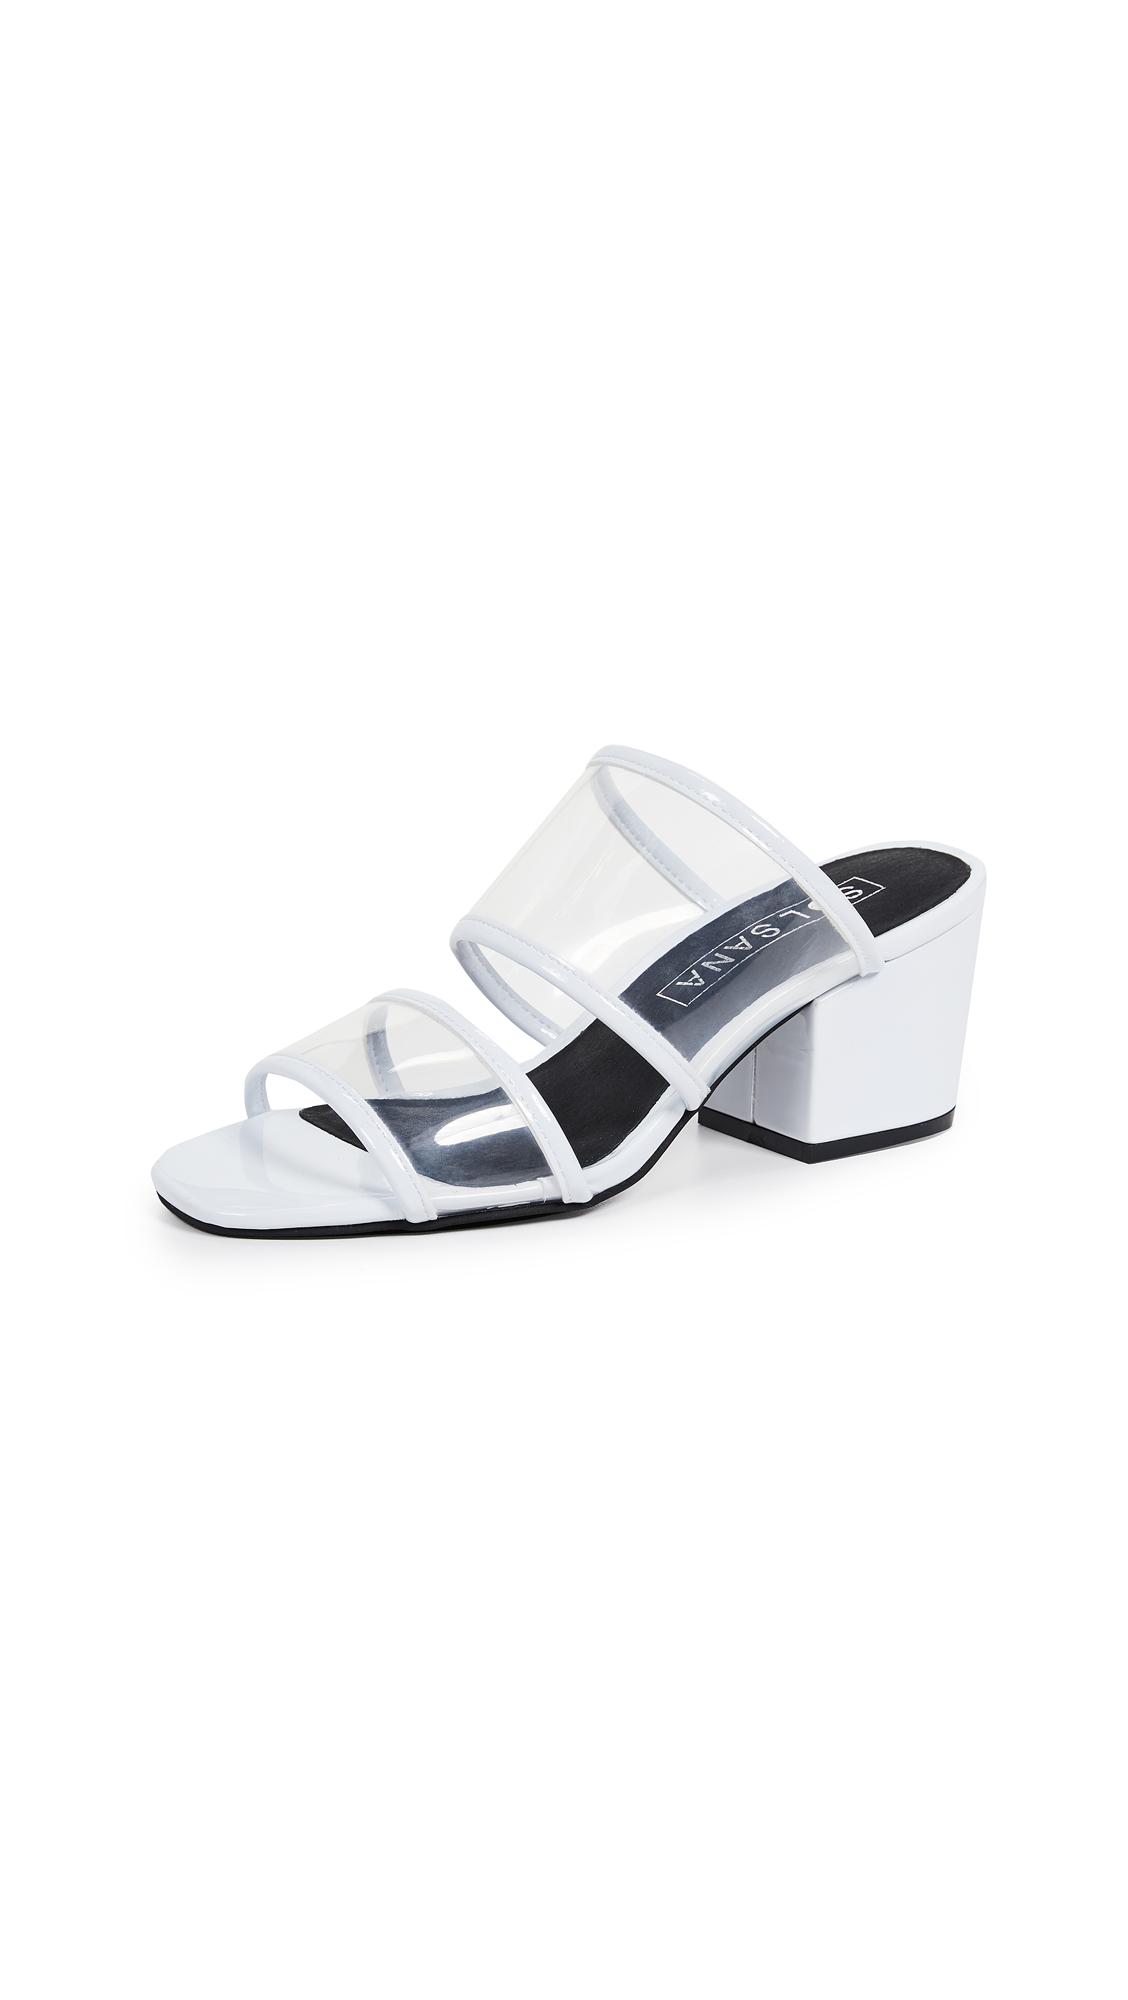 Sol Sana Ziggy Mule Sandals - Patent White